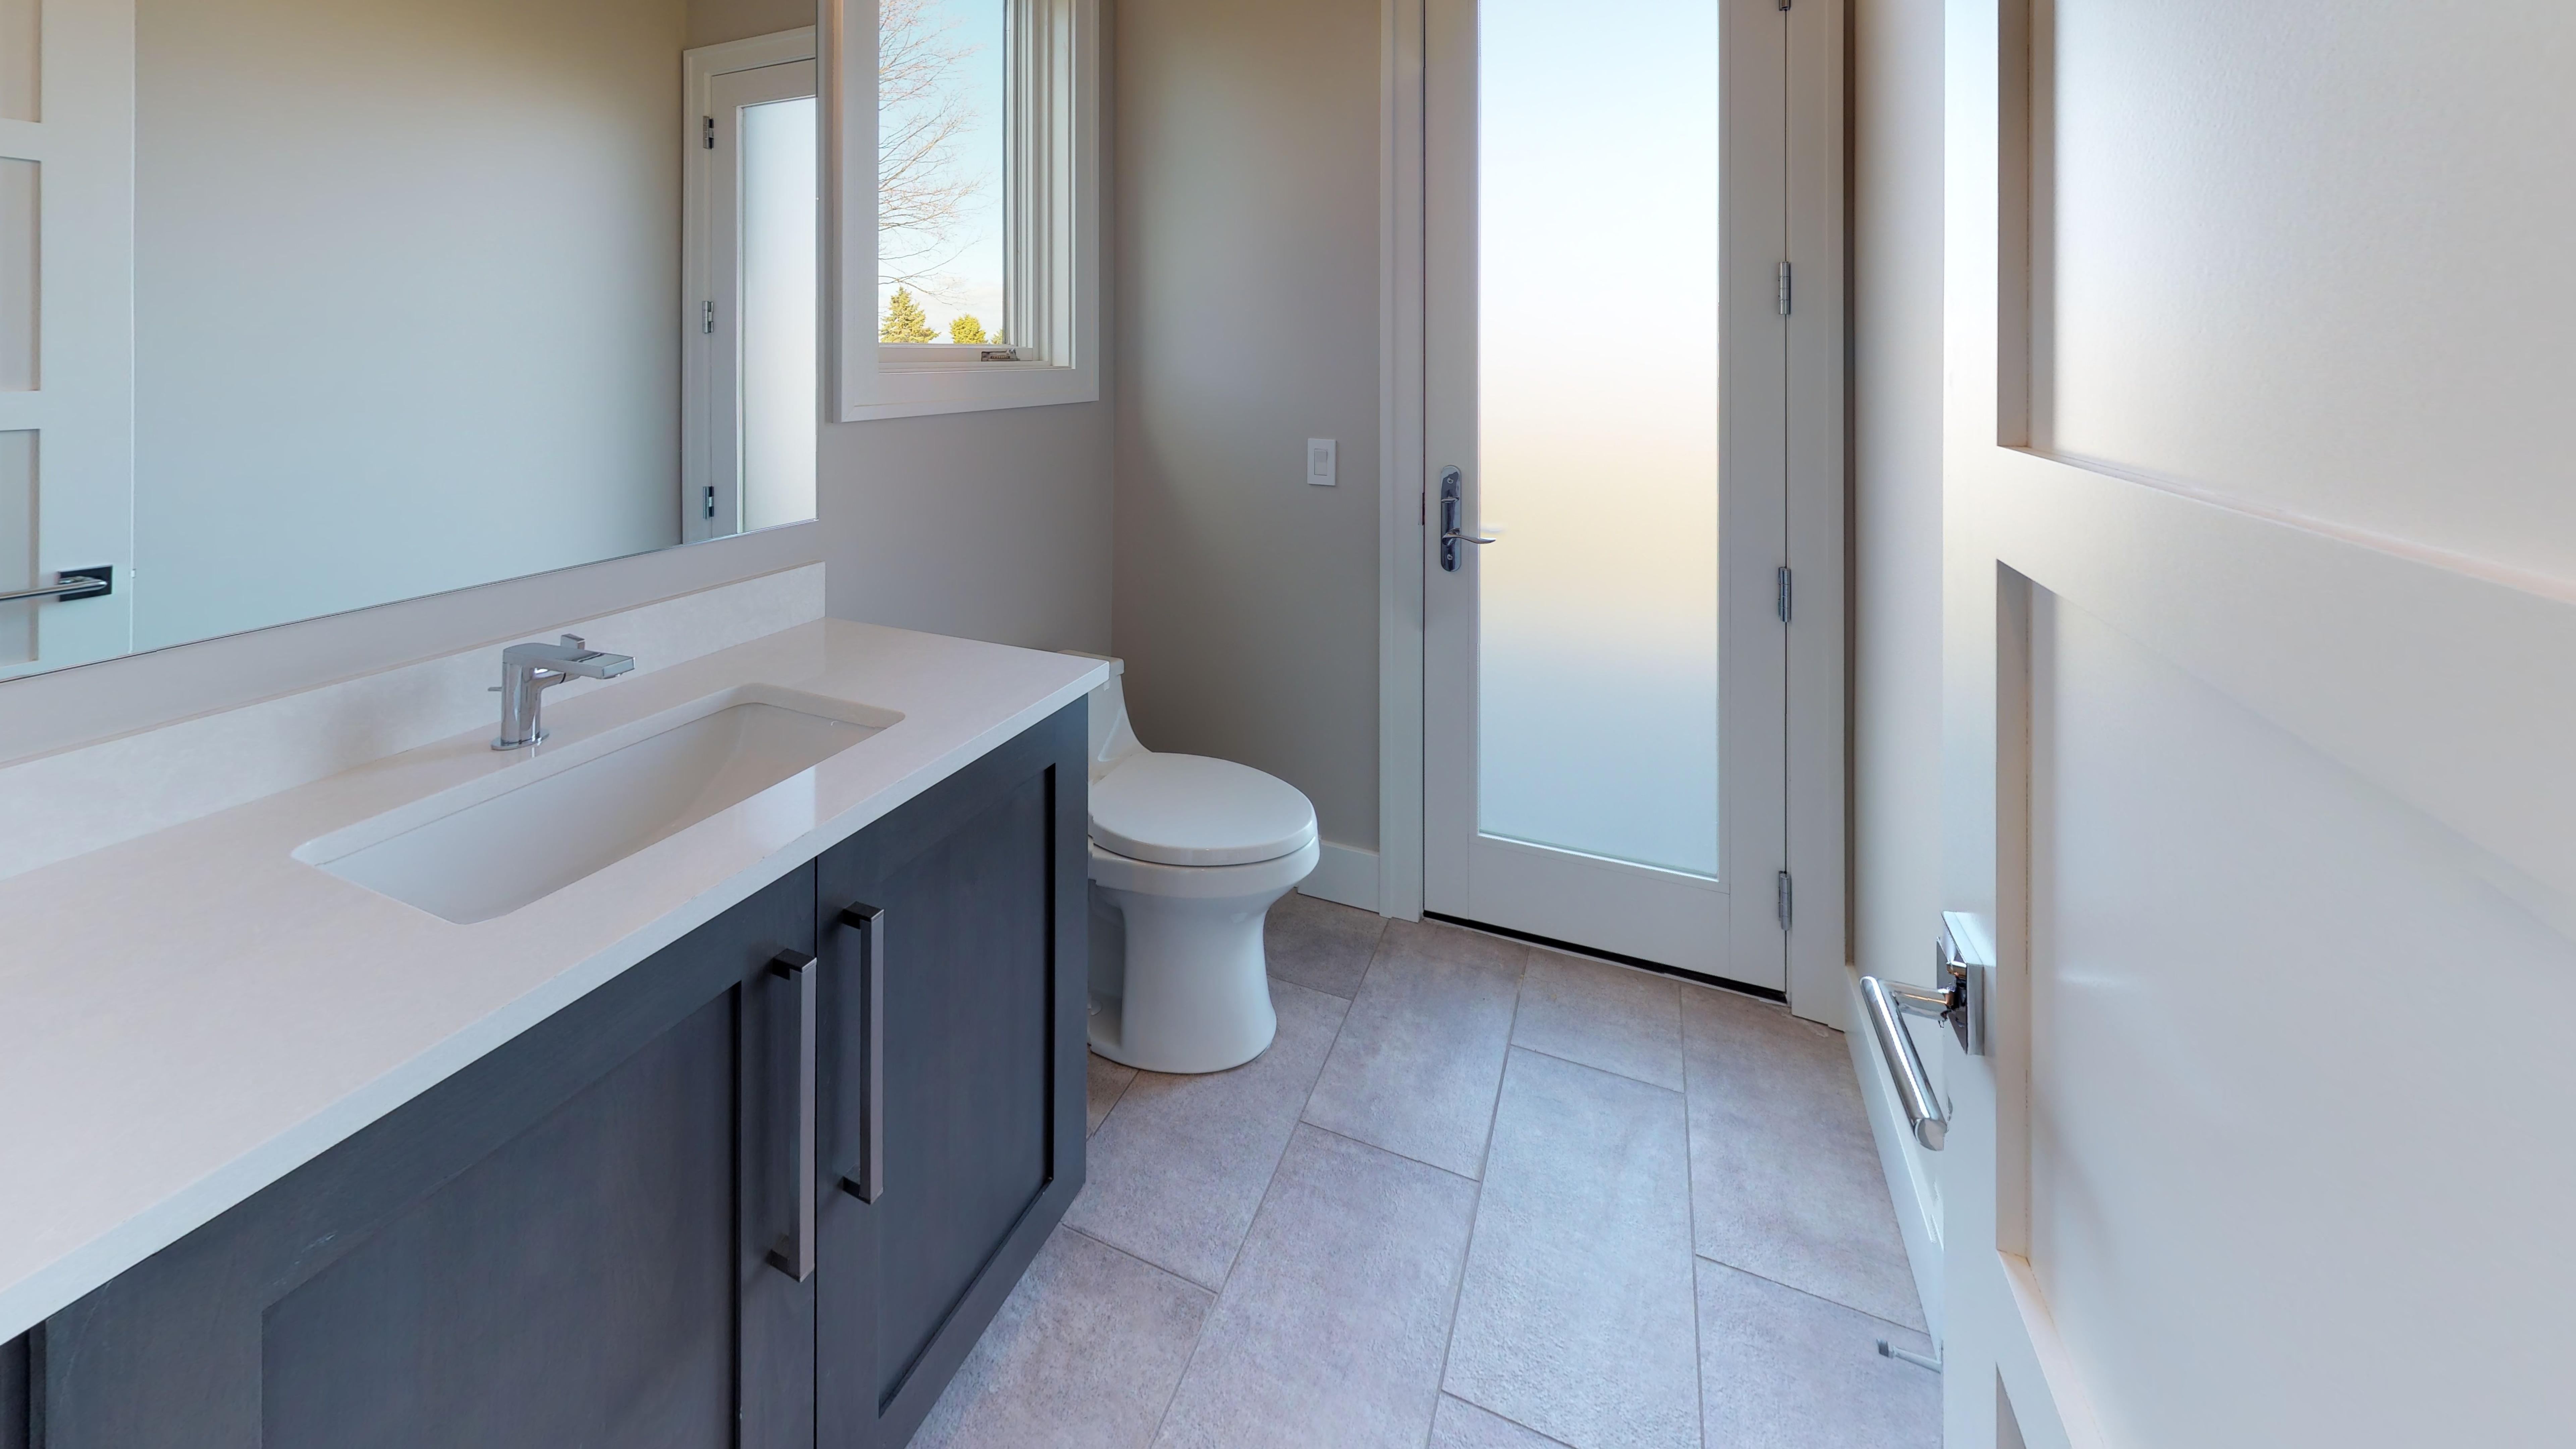 385-Chestnut-Ridge-Bathroom(5).jpg